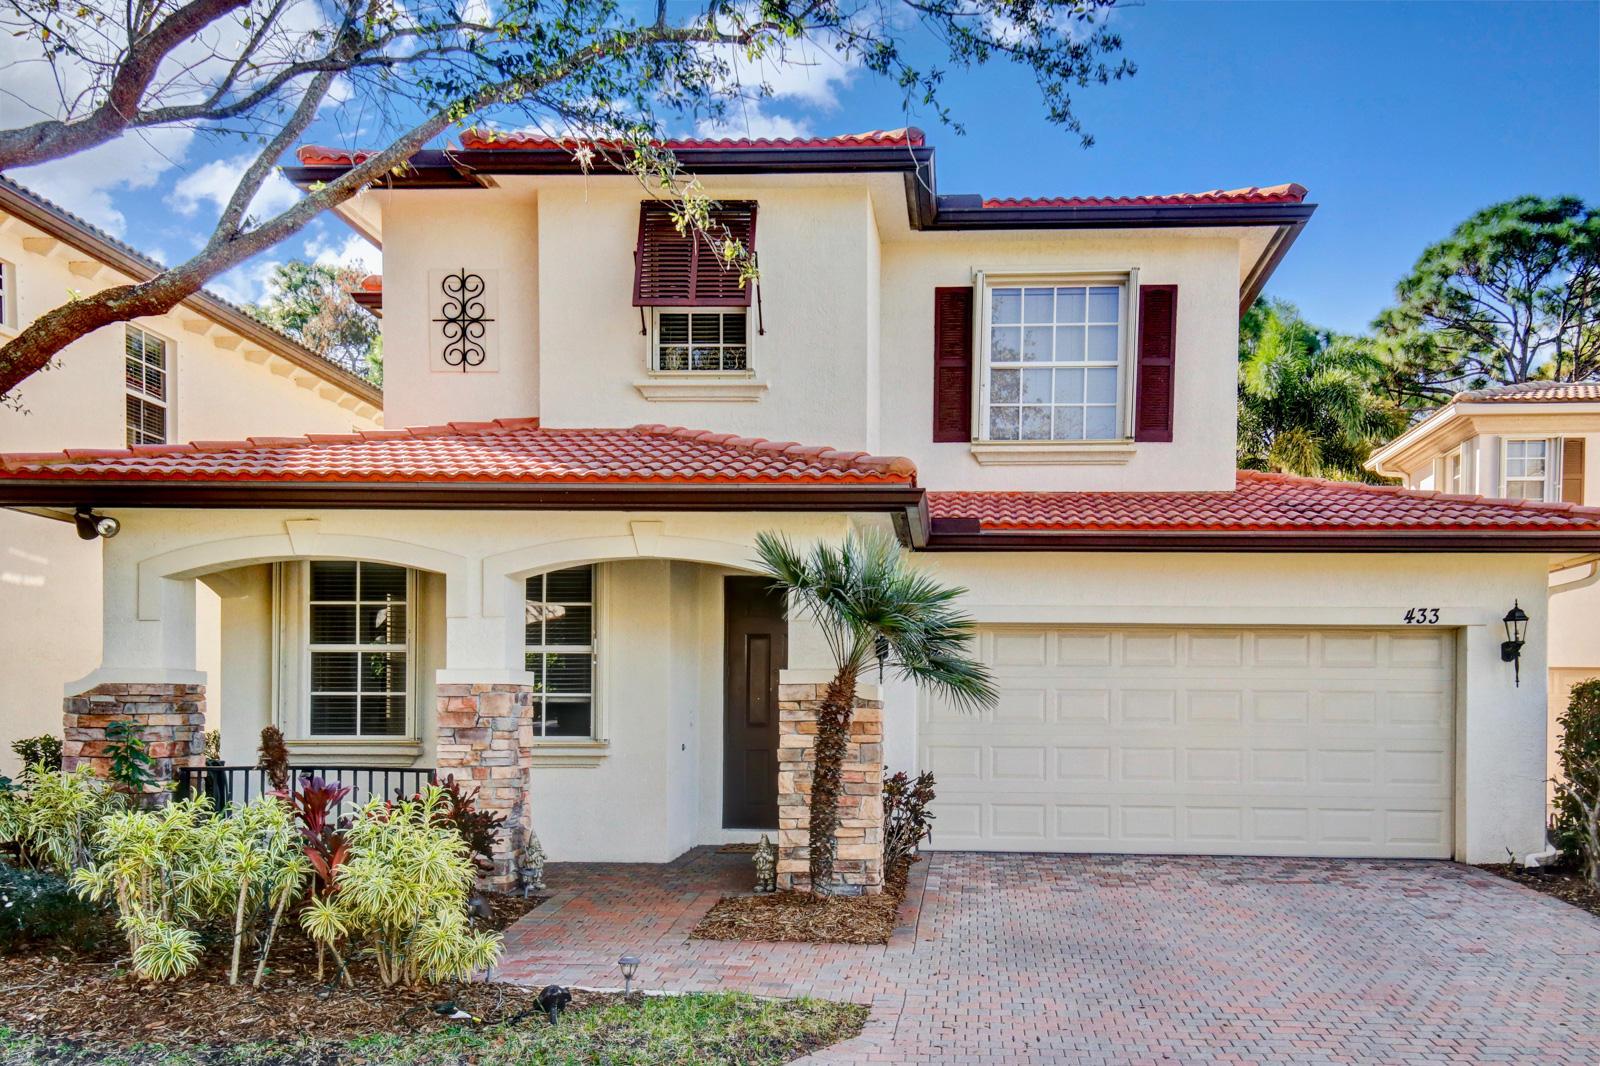 433 Pumpkin Drive, Palm Beach Gardens, Florida 33410, 3 Bedrooms Bedrooms, ,3 BathroomsBathrooms,Single Family,For Sale,Evergrene,Pumpkin,RX-10500584